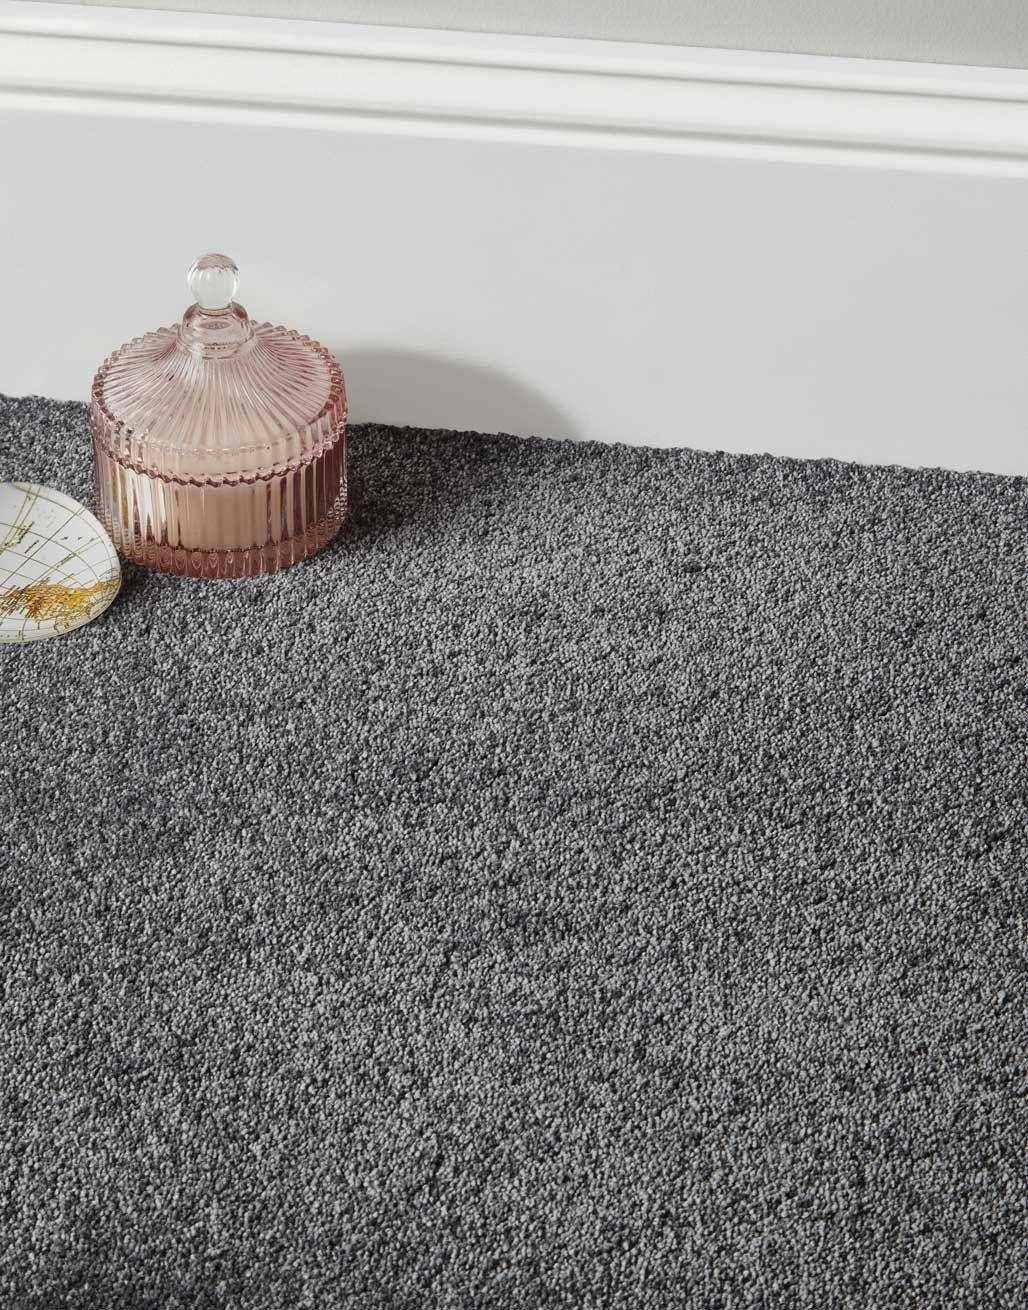 Carpet Runner Installation Guide Bestpricecarpetrunners Product Id 2699862874 Grey Carpet Bedroom Carpet Colors Carpet Installation